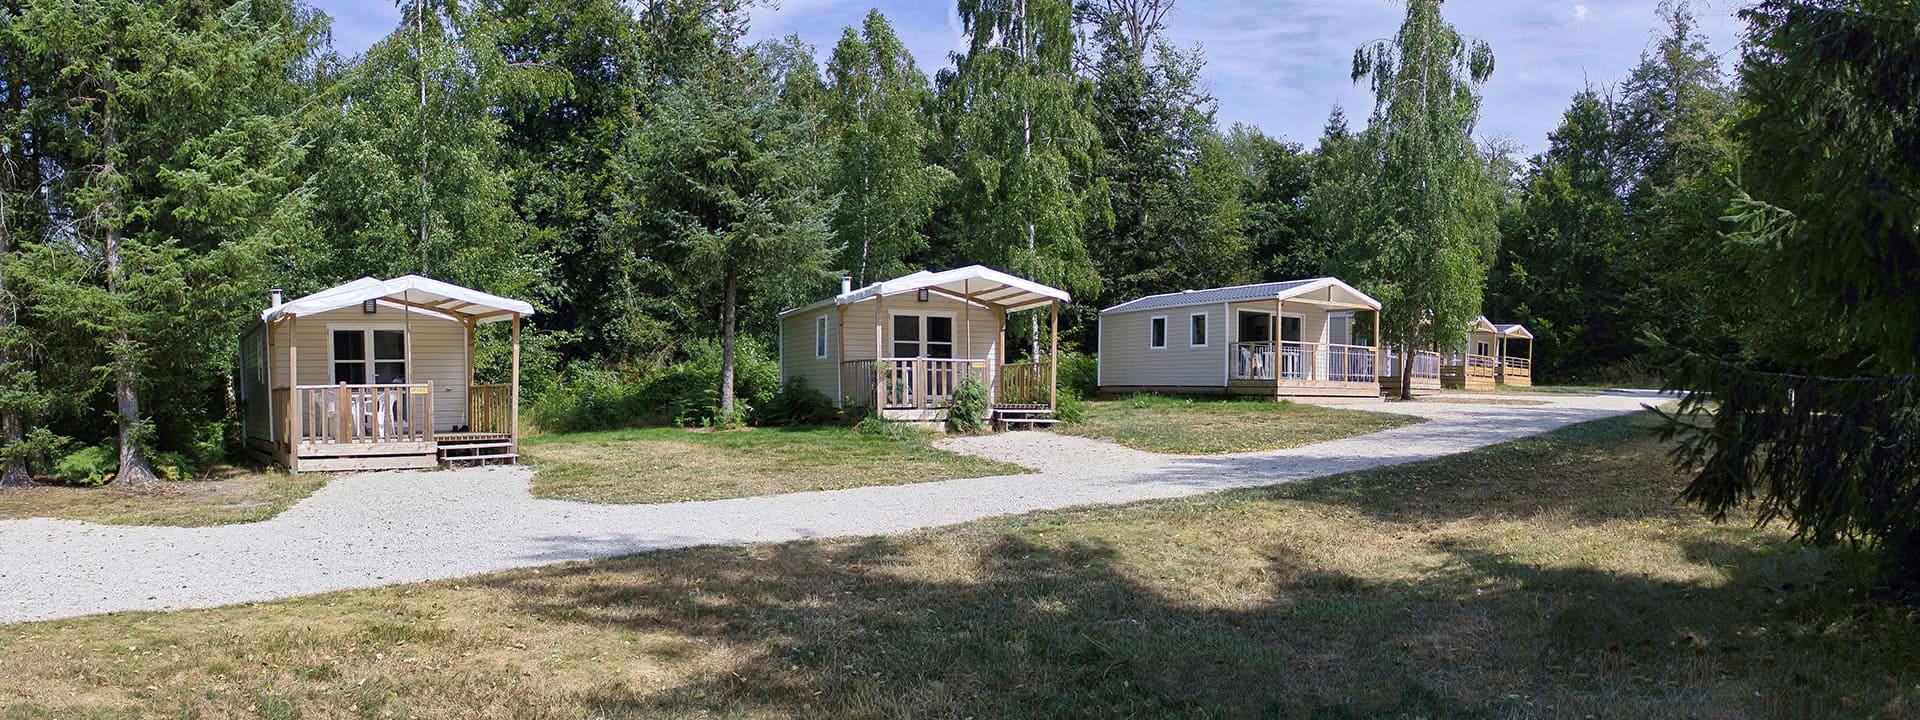 camping porte des vosges a31 bulgn ville r gion grand est. Black Bedroom Furniture Sets. Home Design Ideas